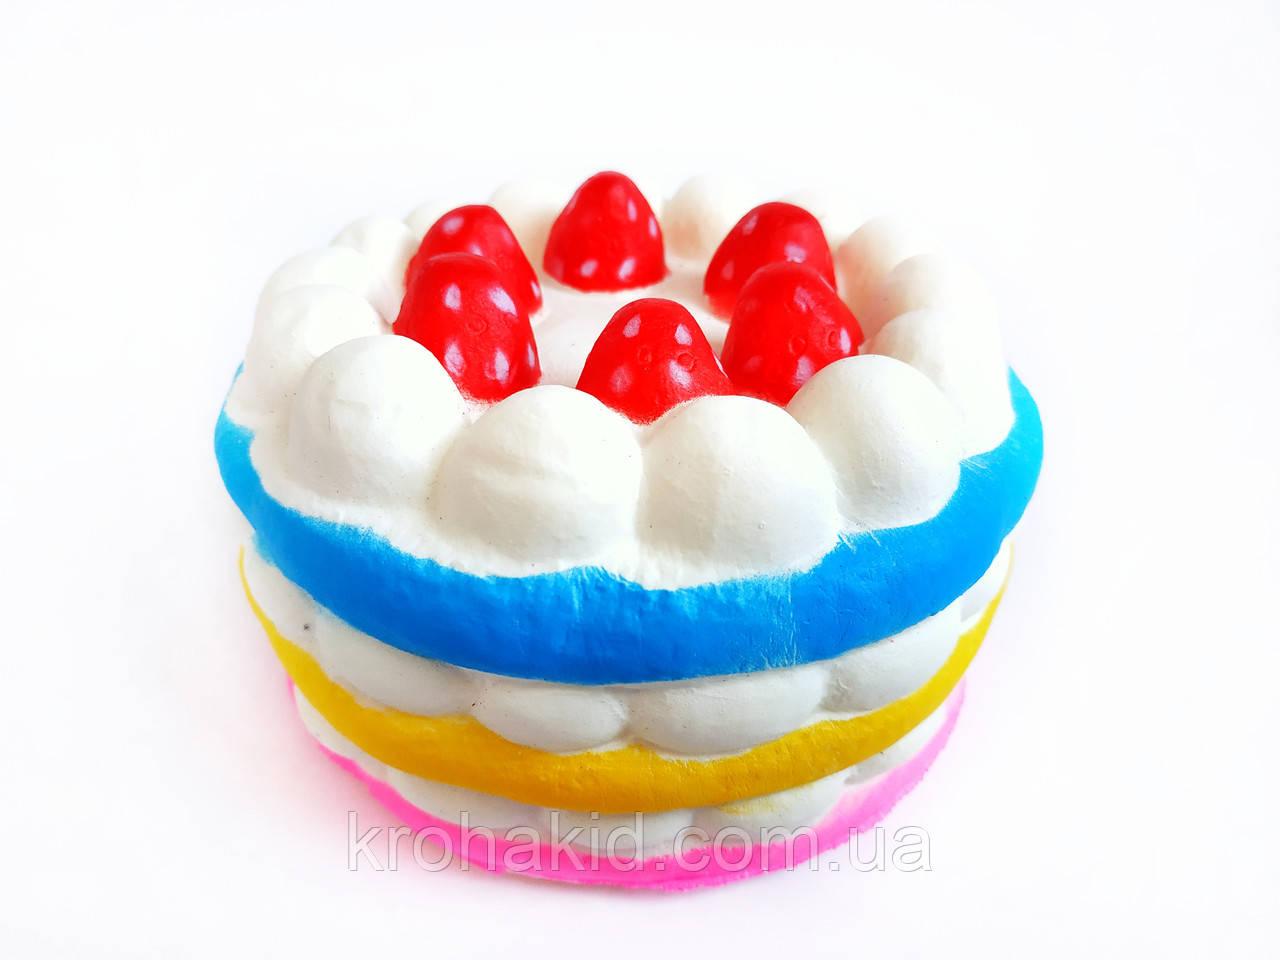 Сквиш Тортик / Торт с малиной / Squishy / Сквуши/ Игрушка-антистересс